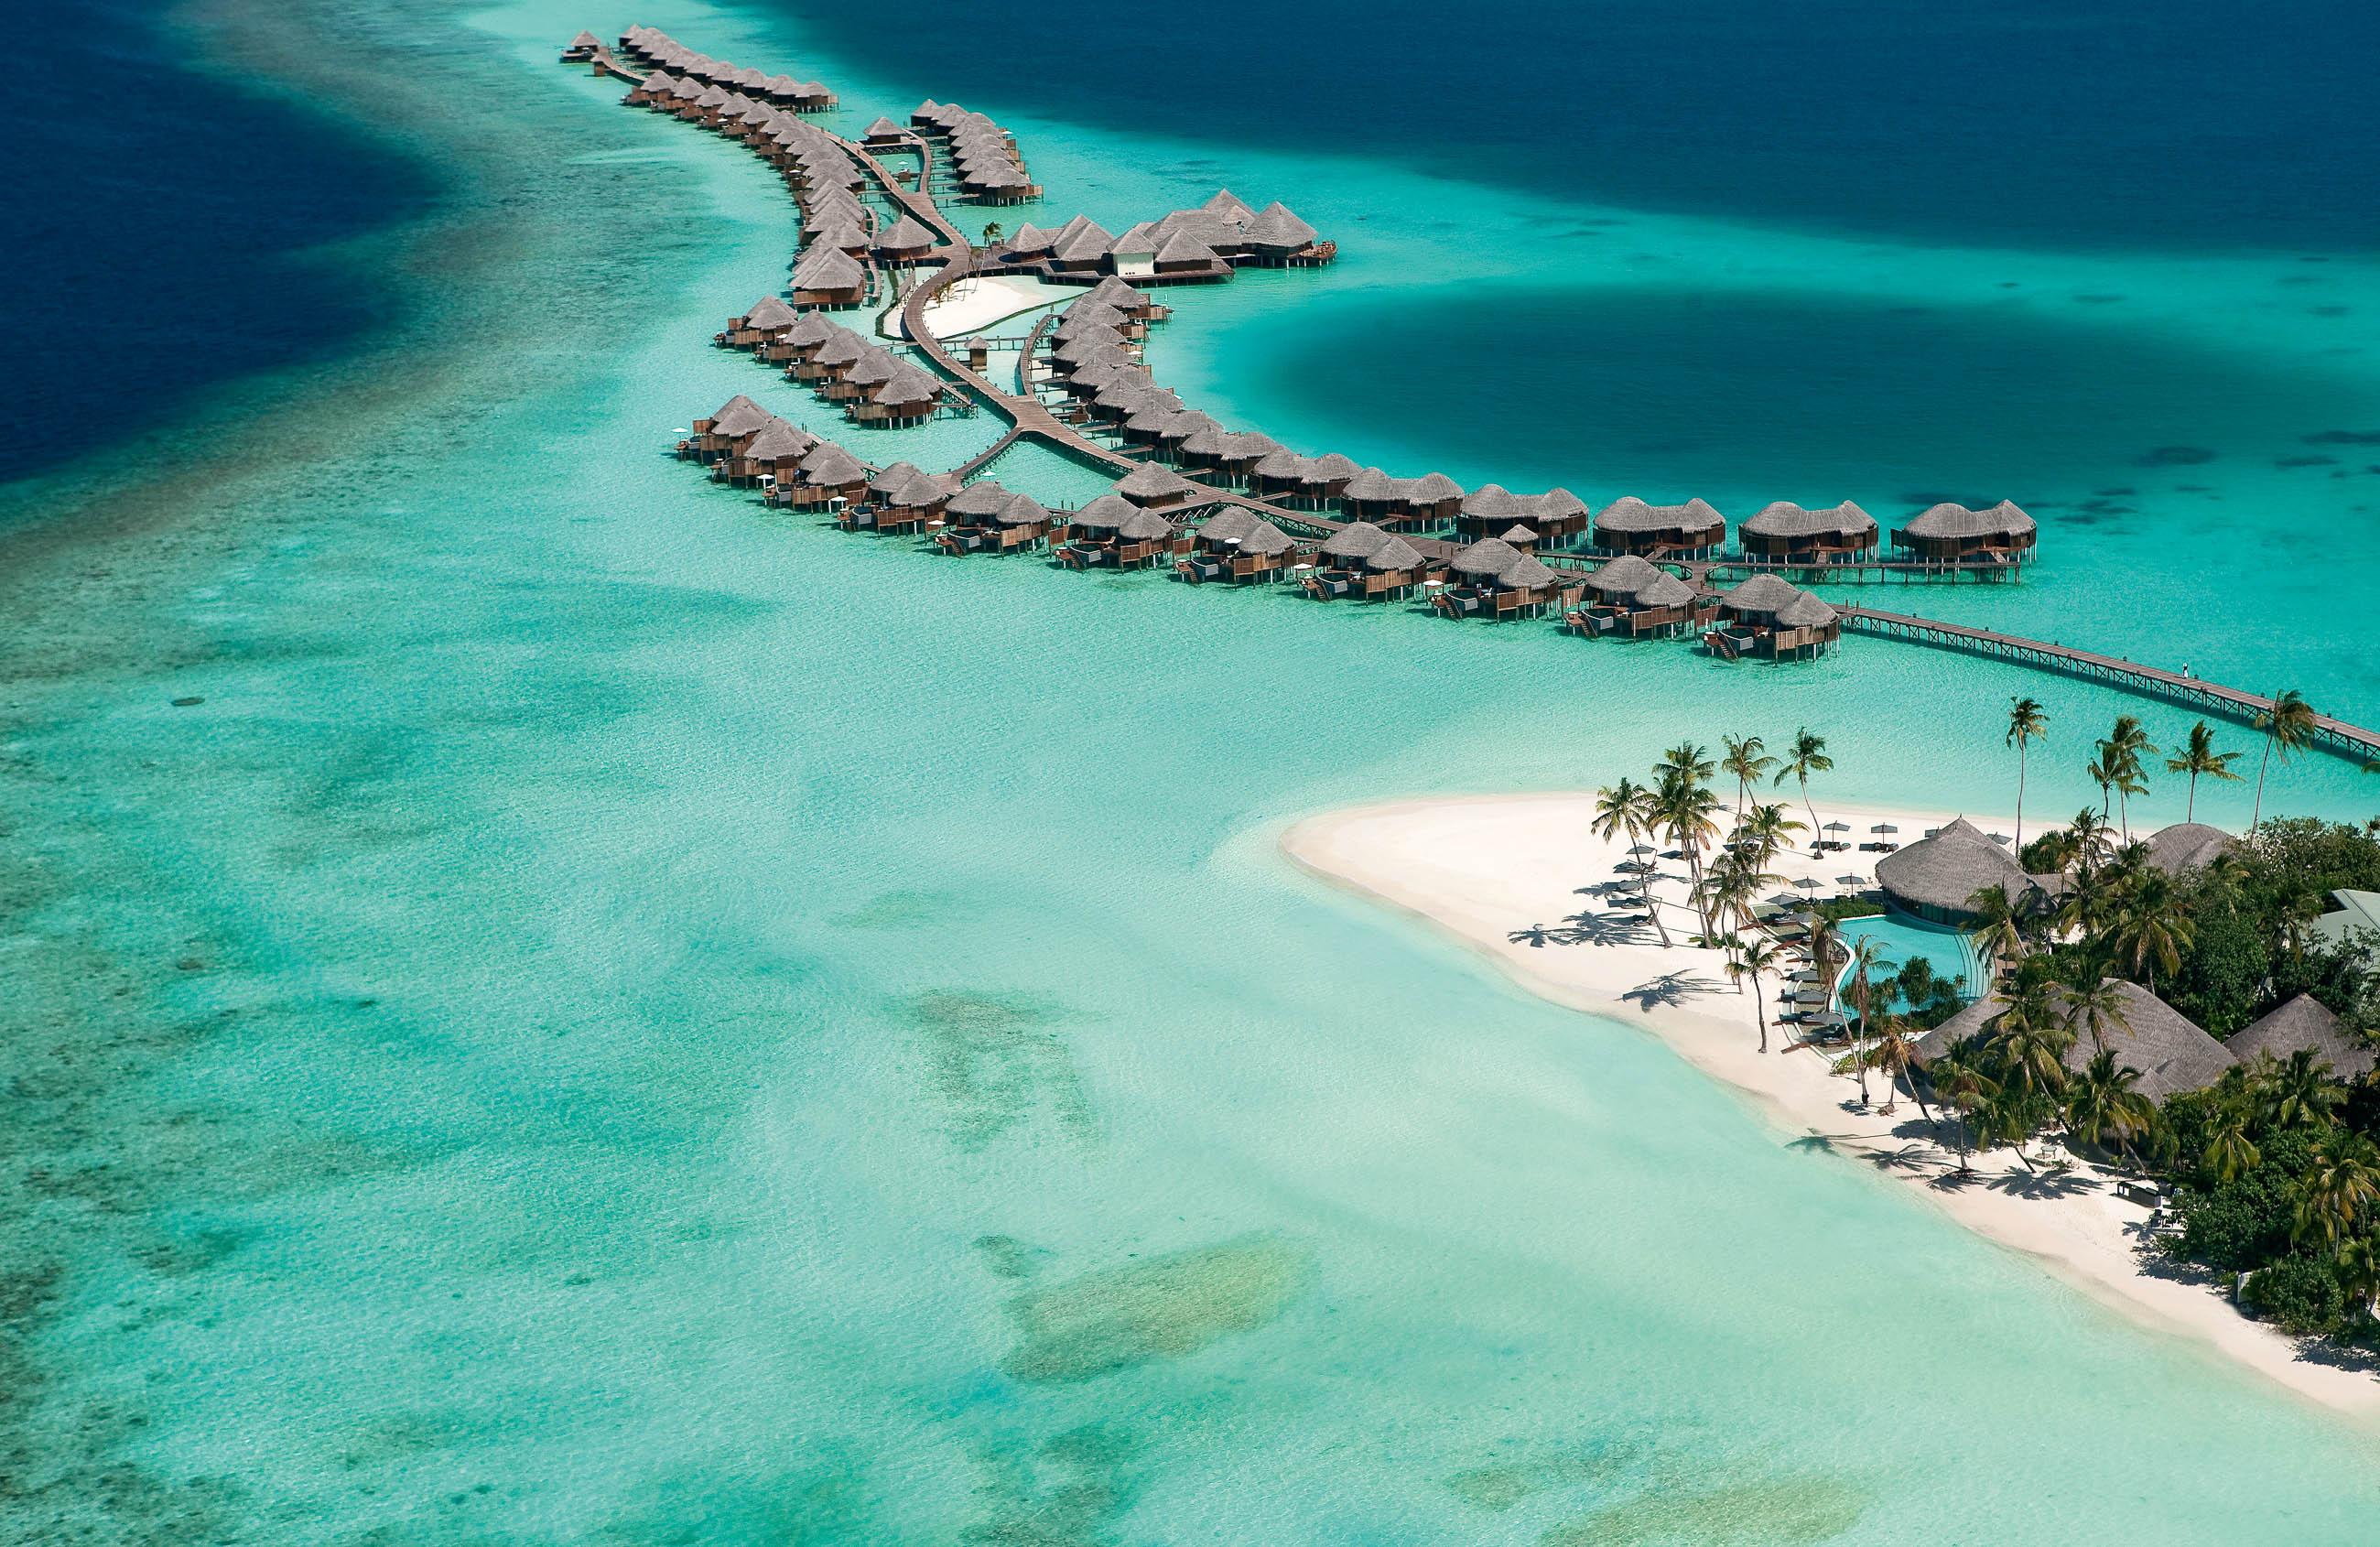 https://bubo.sk/uploads/galleries/16372/halaveli-maldives-aerial-view-9_hd-16.jpg